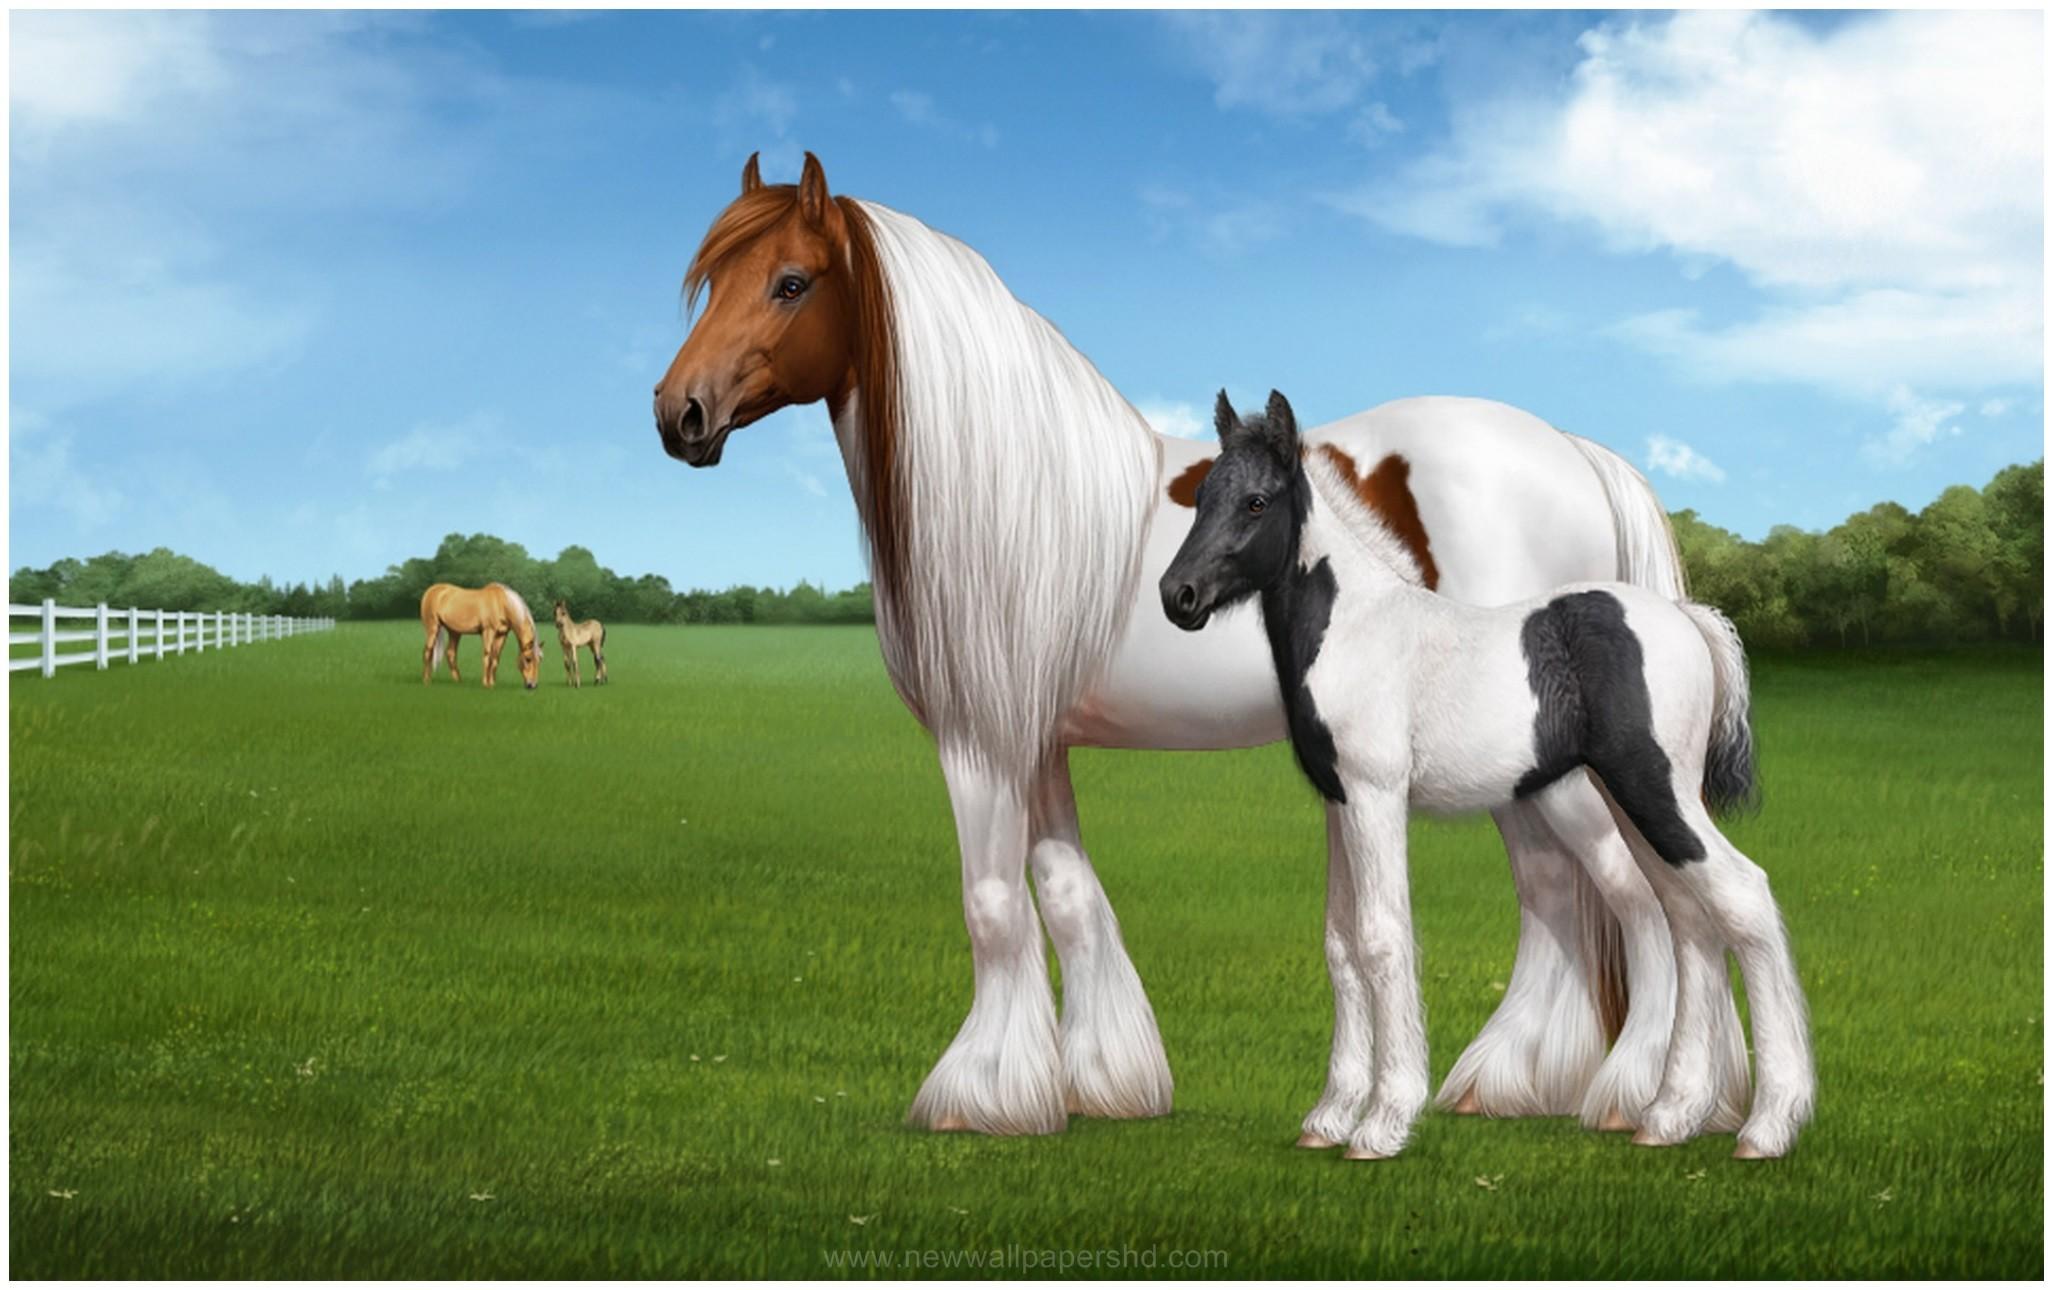 Res: 2053x1290, GYPSY HORSE HD WALLPAPER